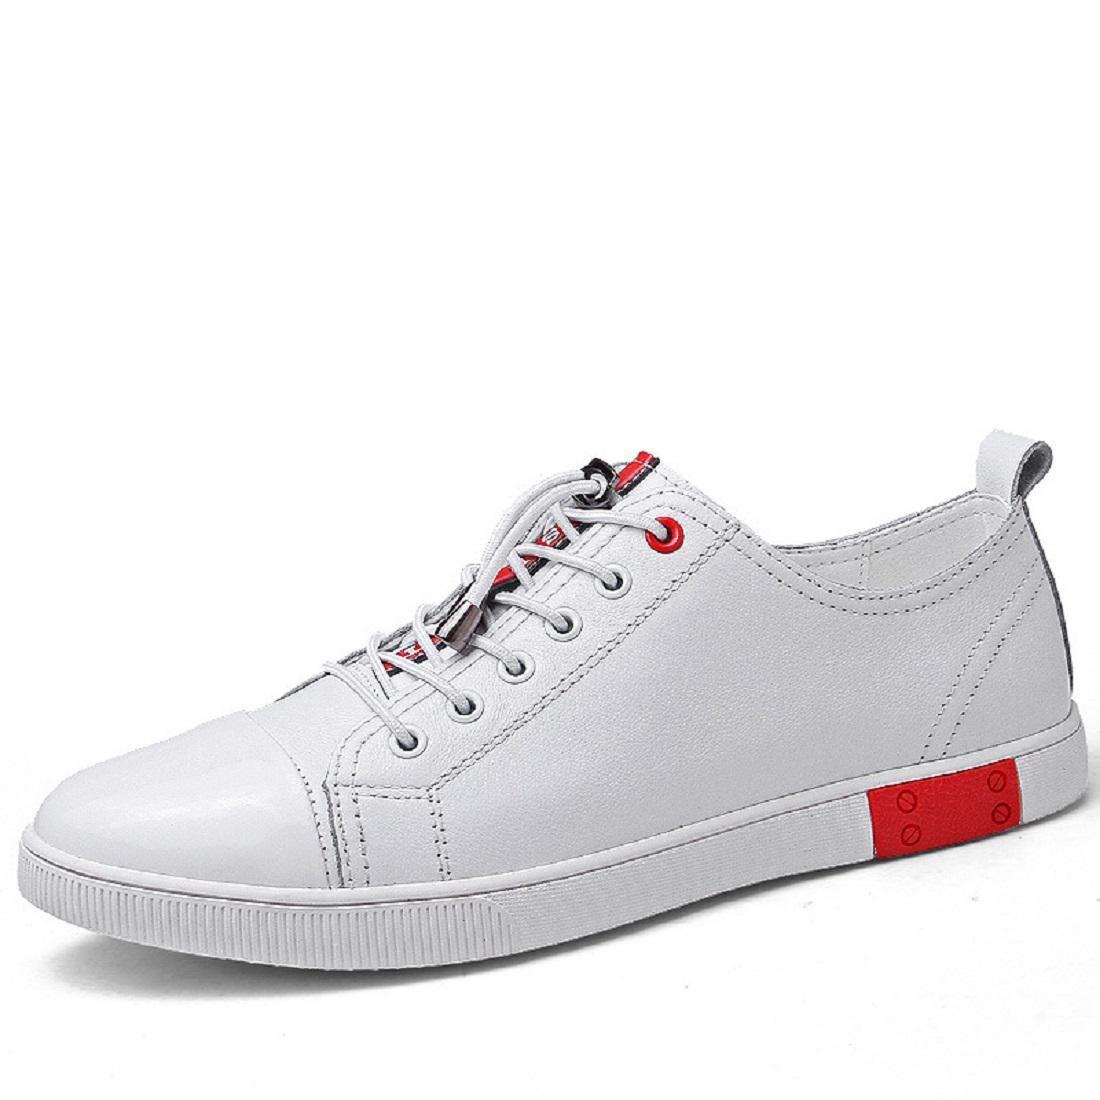 Herren Mode Flache Schuhe Licht Atmungsaktiv Lässige Schuhe Rutschfest Ausbilder EUR GRÖSSE 38-44